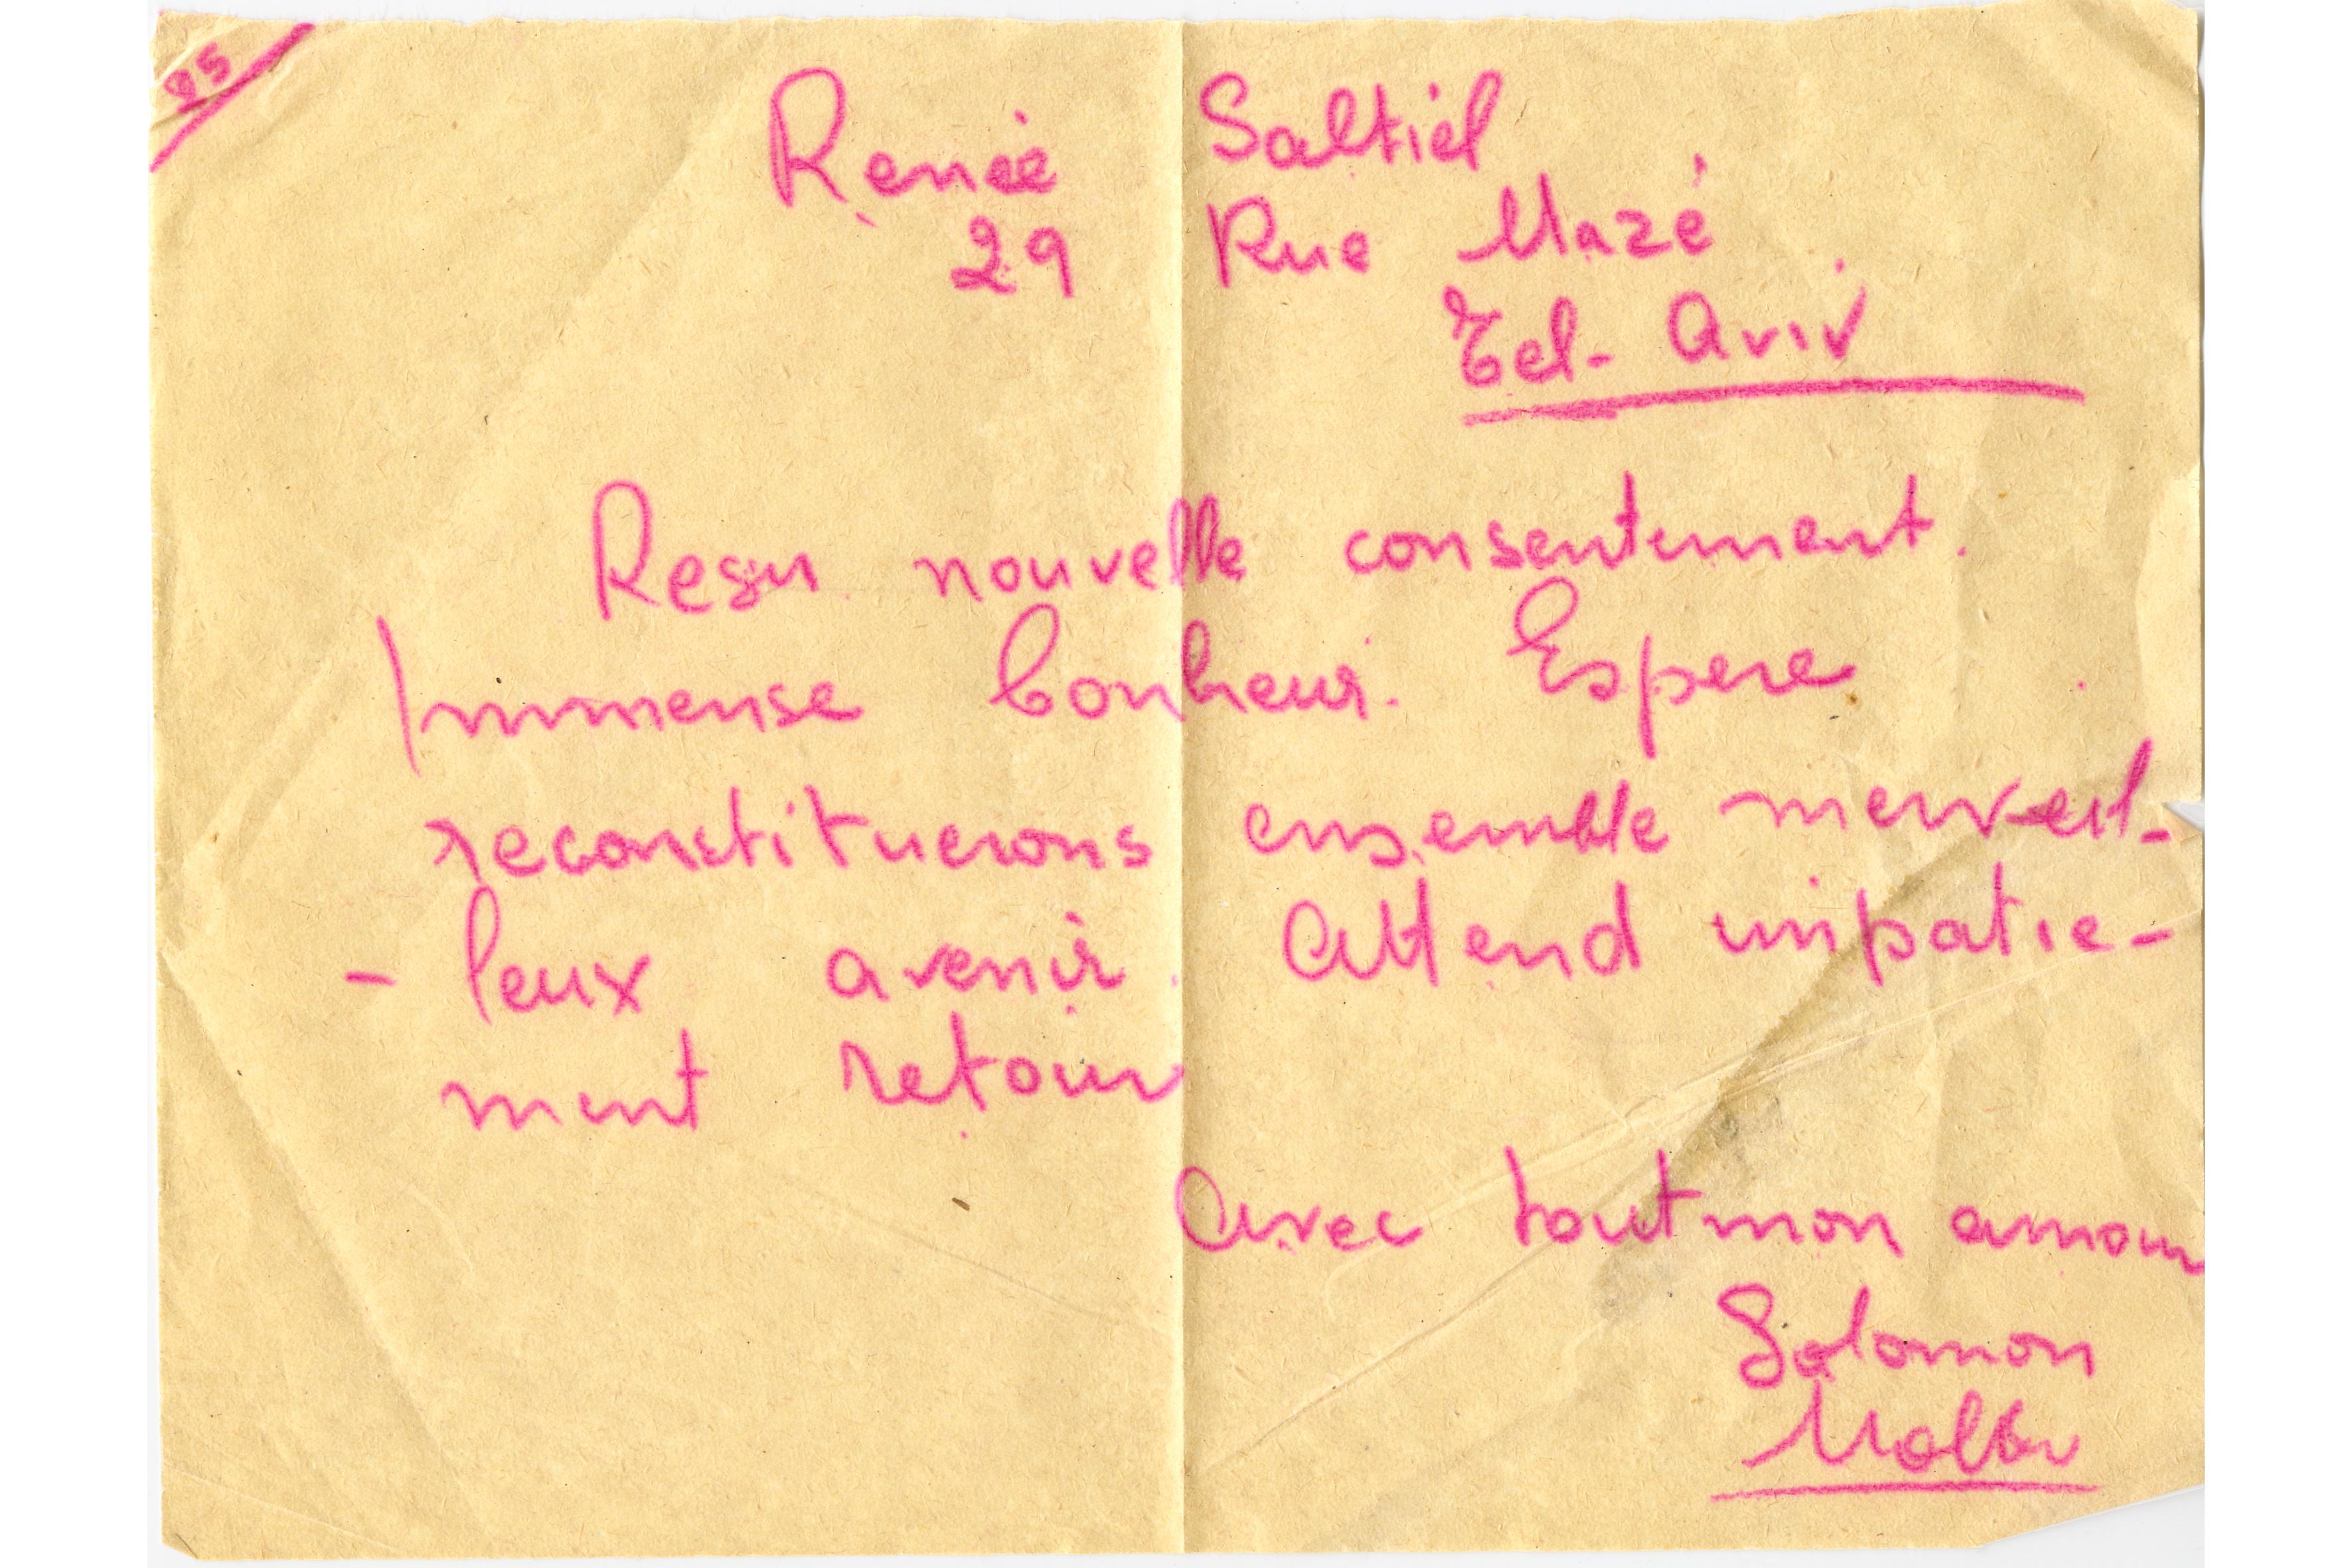 Solon Molho's telegram to his future wife